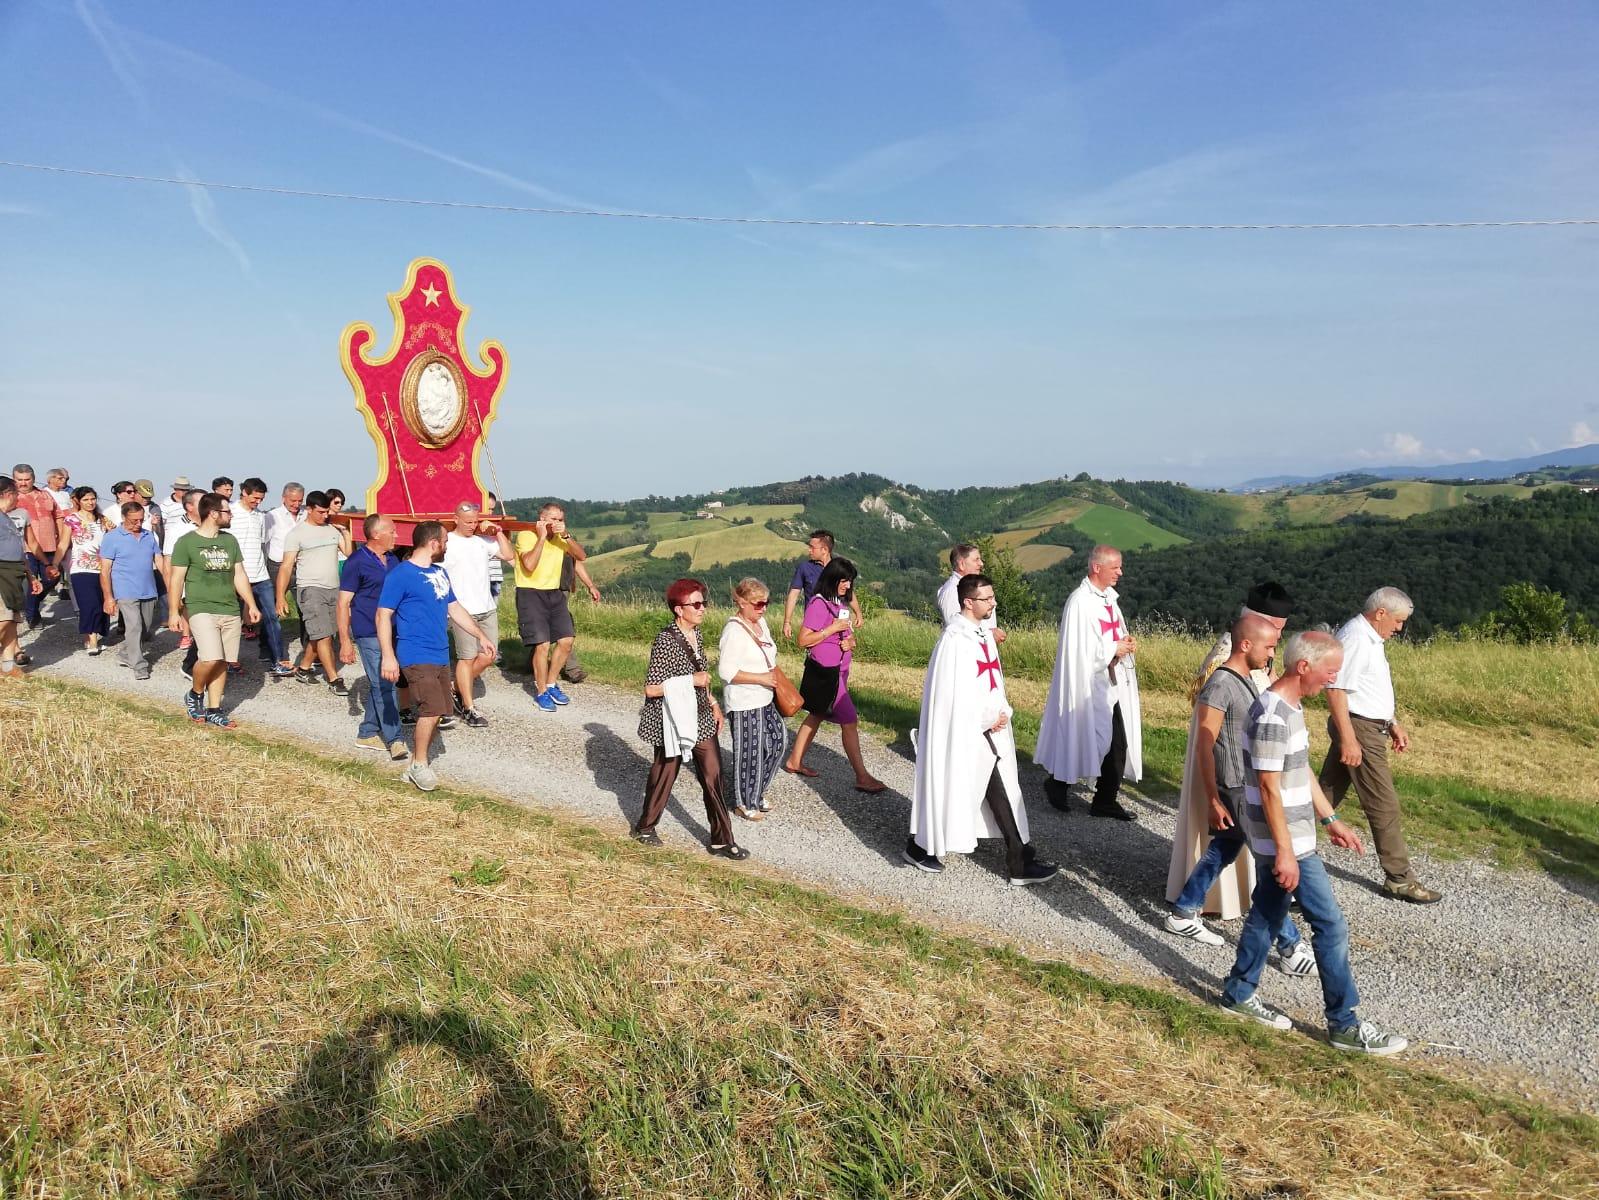 S. Messa giugno 2018 Parma